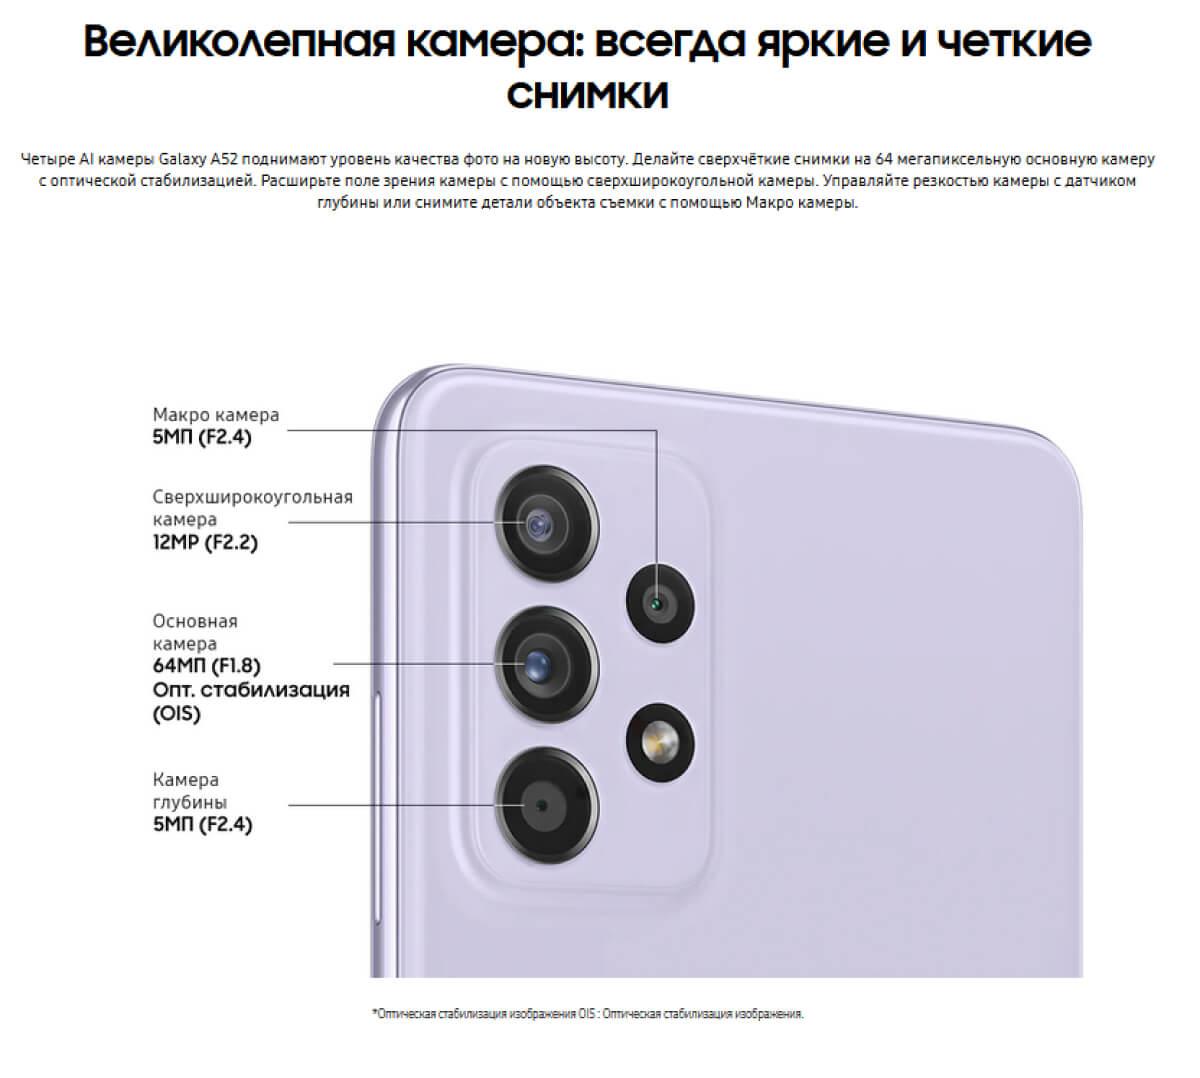 Samsung Galaxy A52 8/256 GB Голубой купить